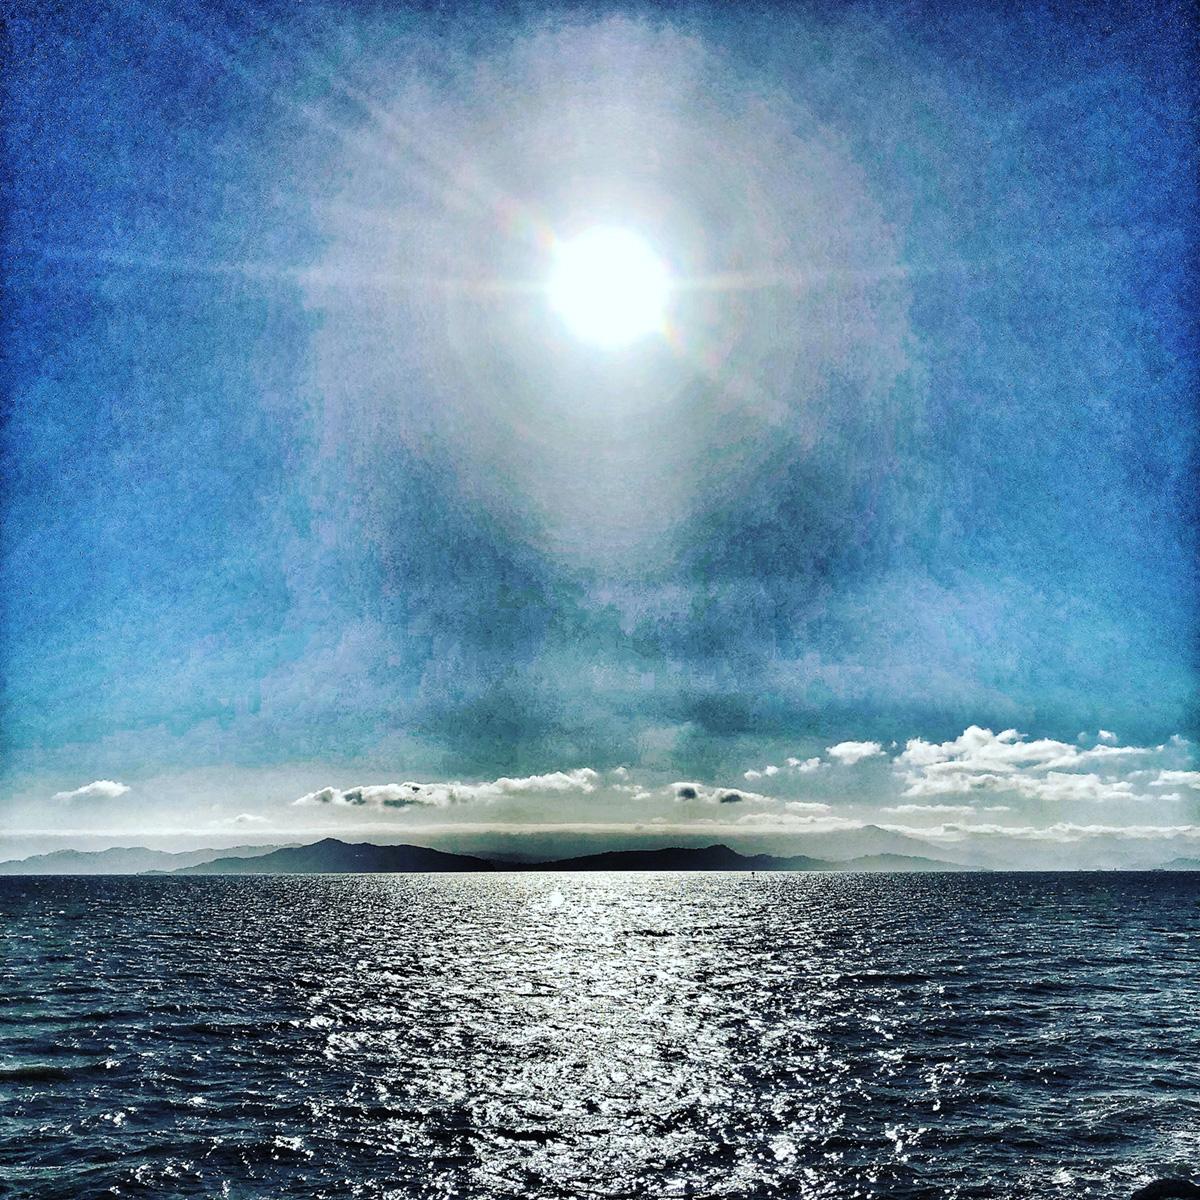 Blue Skies in the Bay